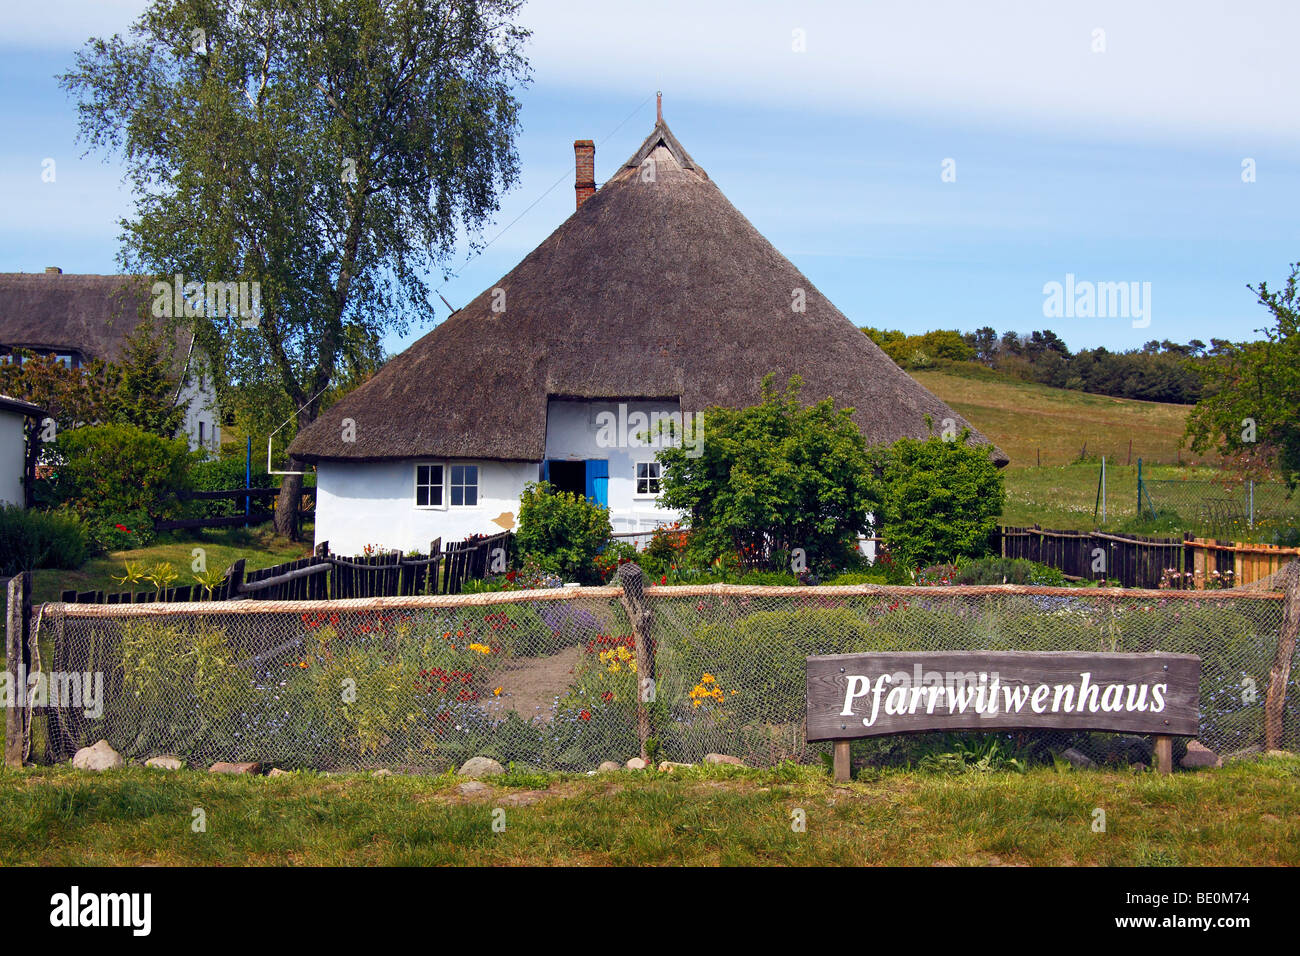 Thatched house, Pfarrwitwenhaus, Gross Zicker, Moenchsgut, Ruegen island, Mecklenburg-Western-Pomerania, Germany, - Stock Image